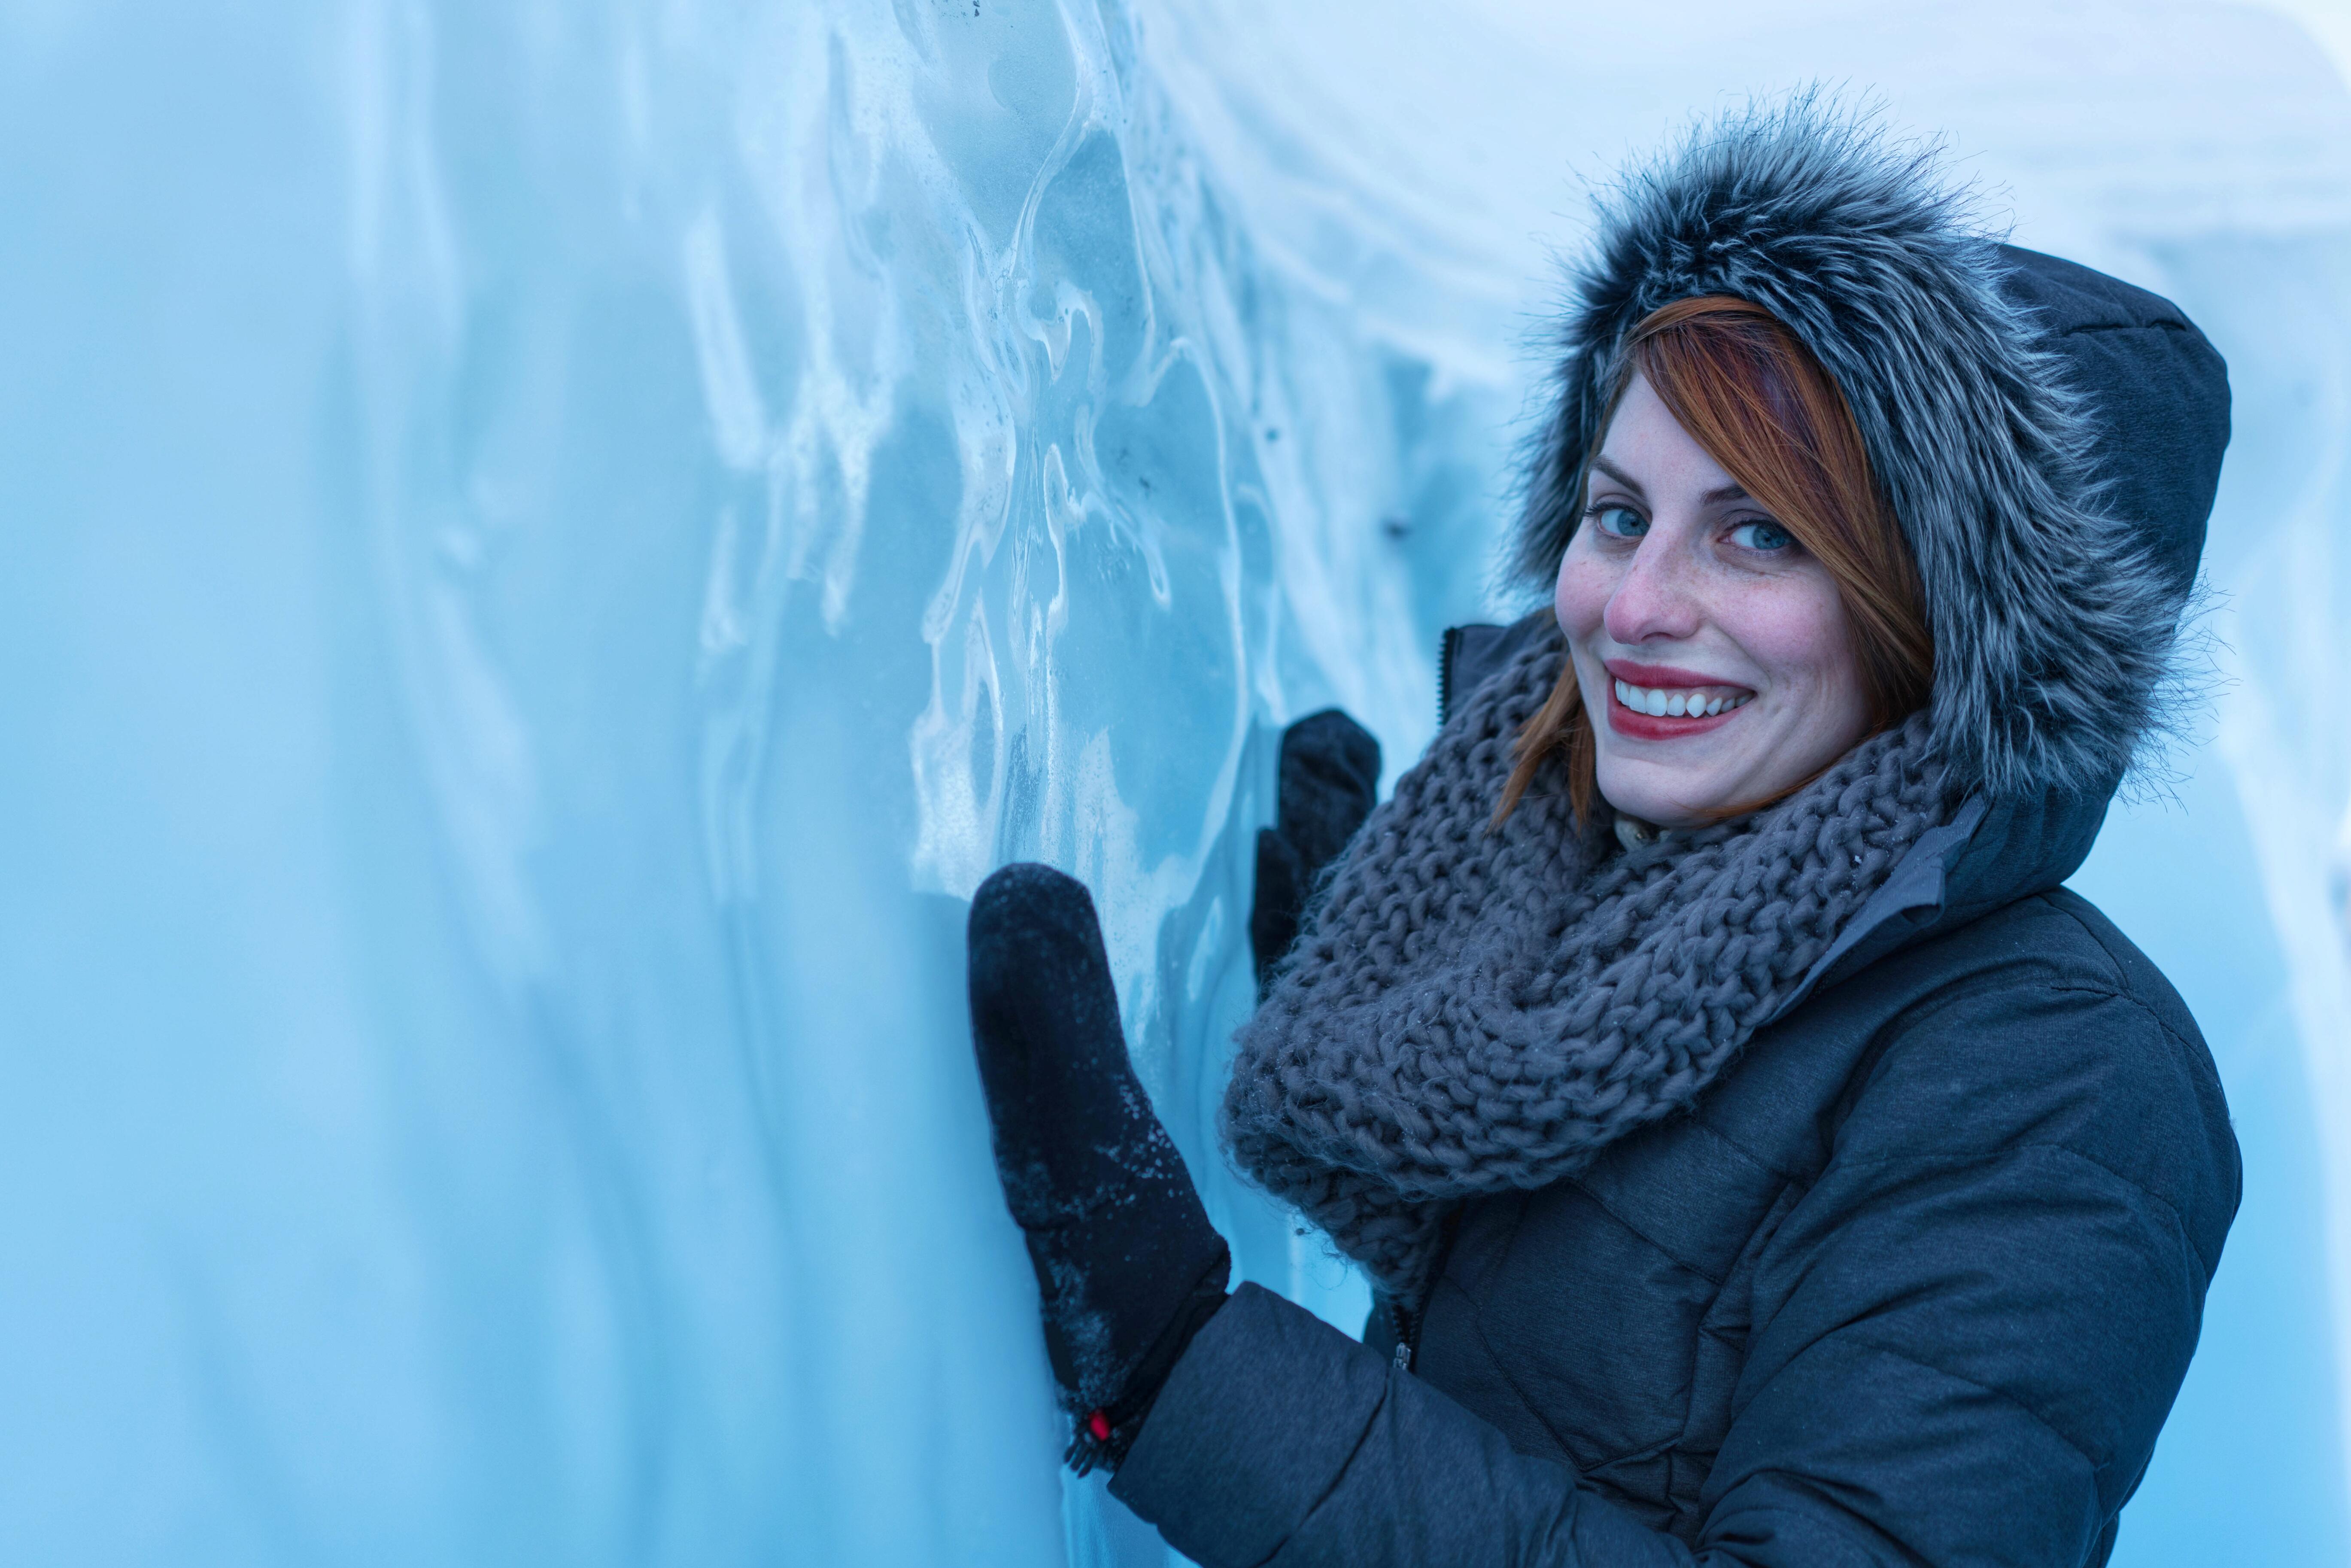 Delphia McCarty Matanuska Glacier